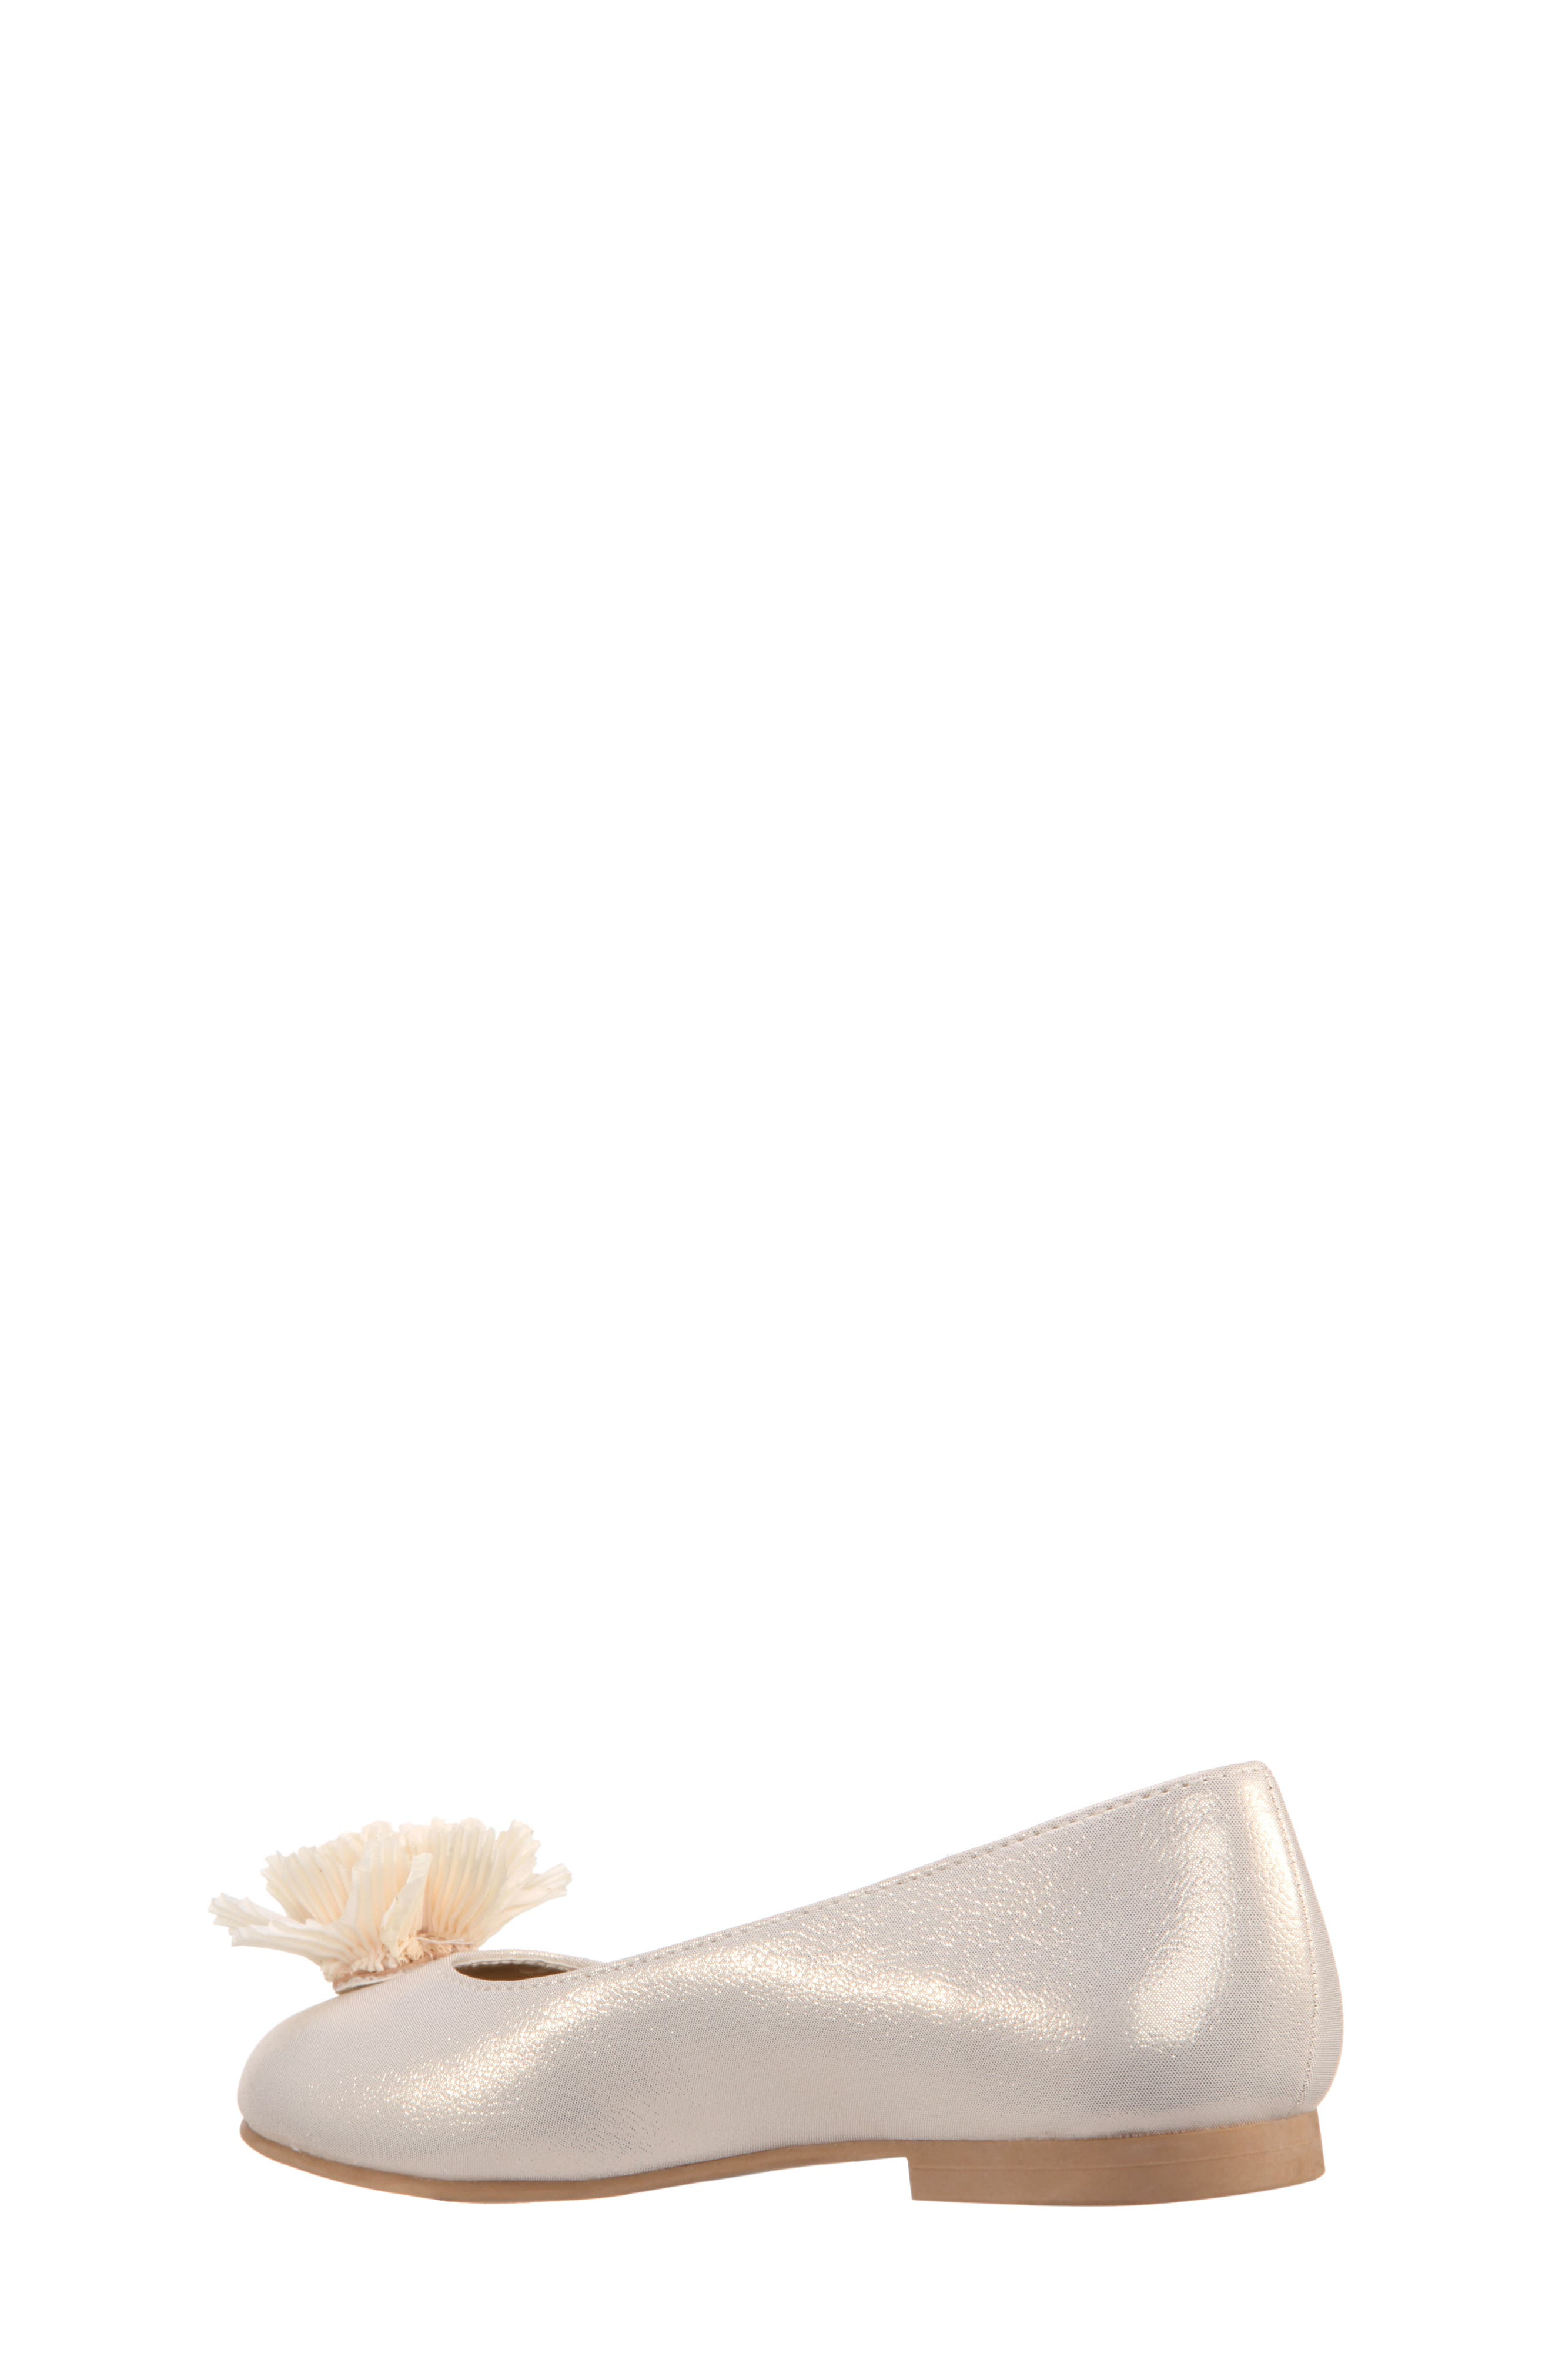 Jemma Flower Ballet Flat,                             Alternate thumbnail 2, color,                             Platino Metallic